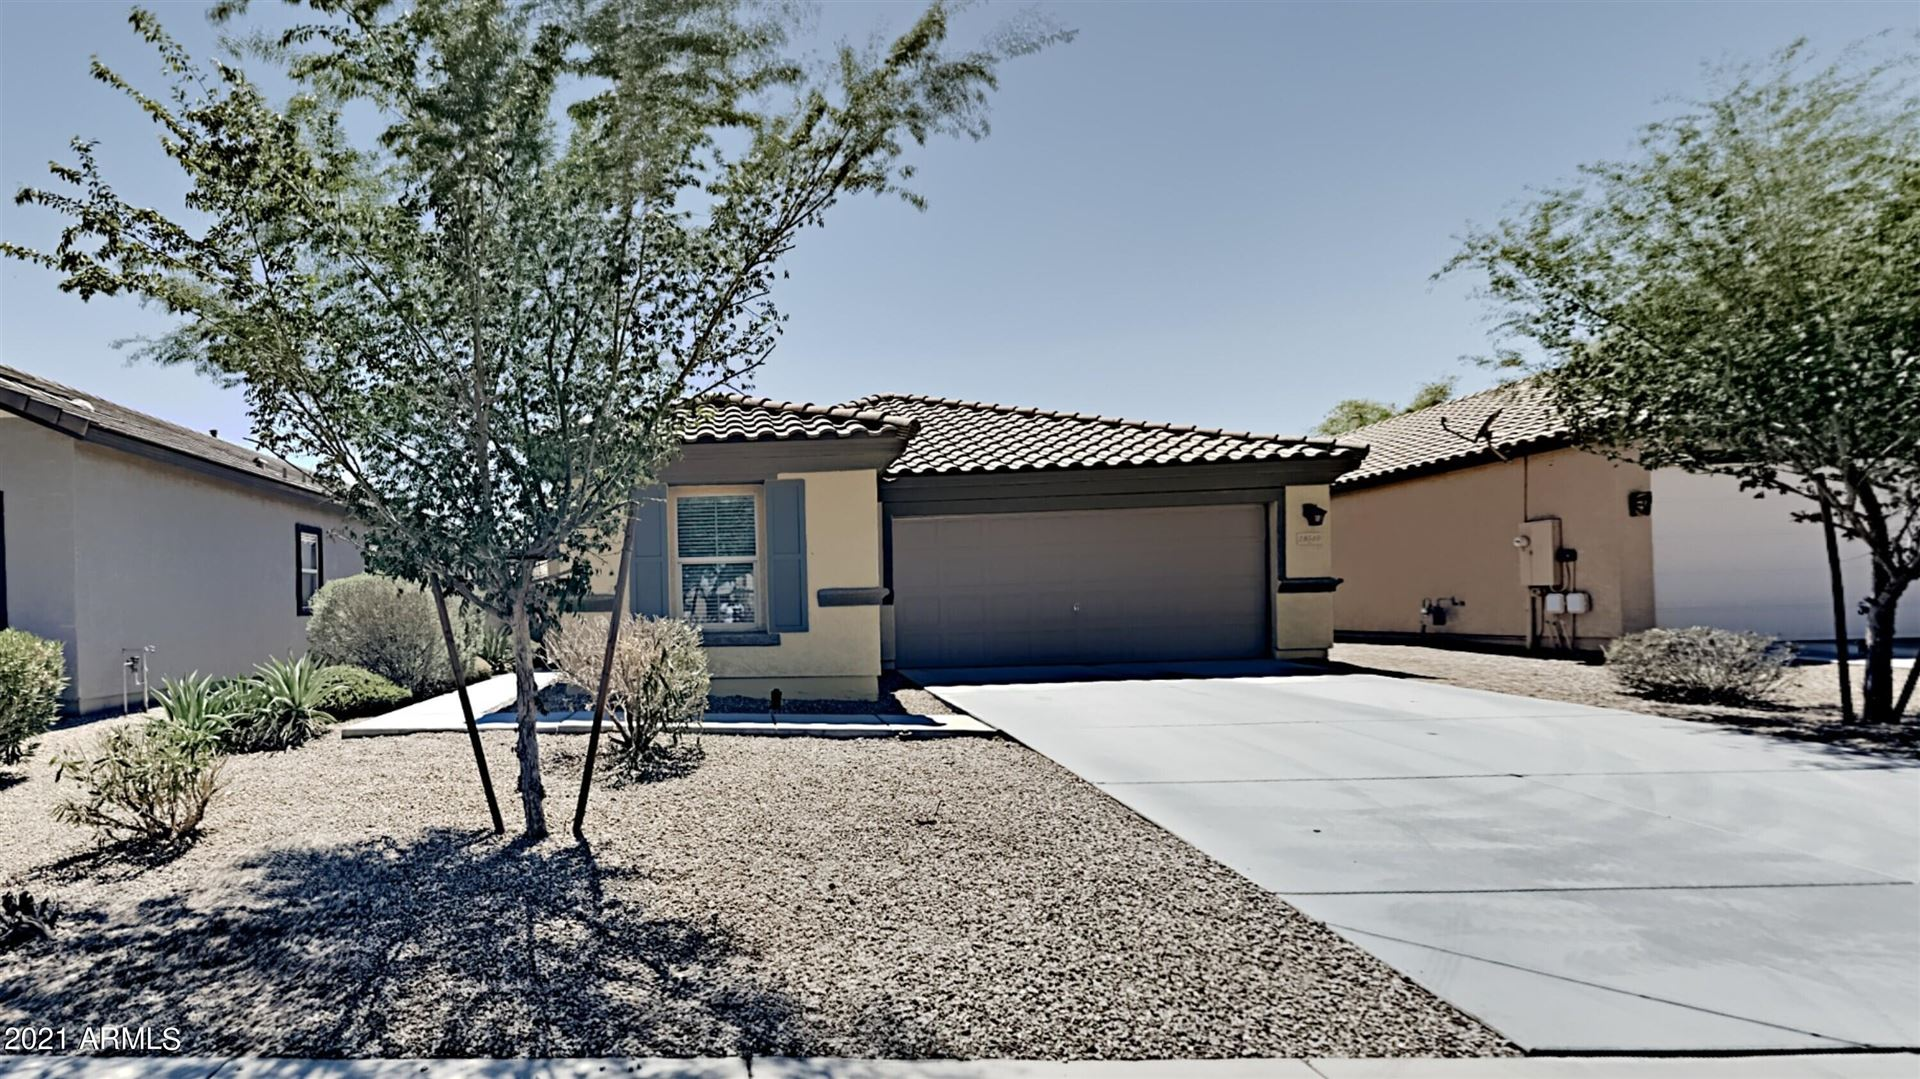 Photo for 18540 N CELIS Street, Maricopa, AZ 85138 (MLS # 6238708)